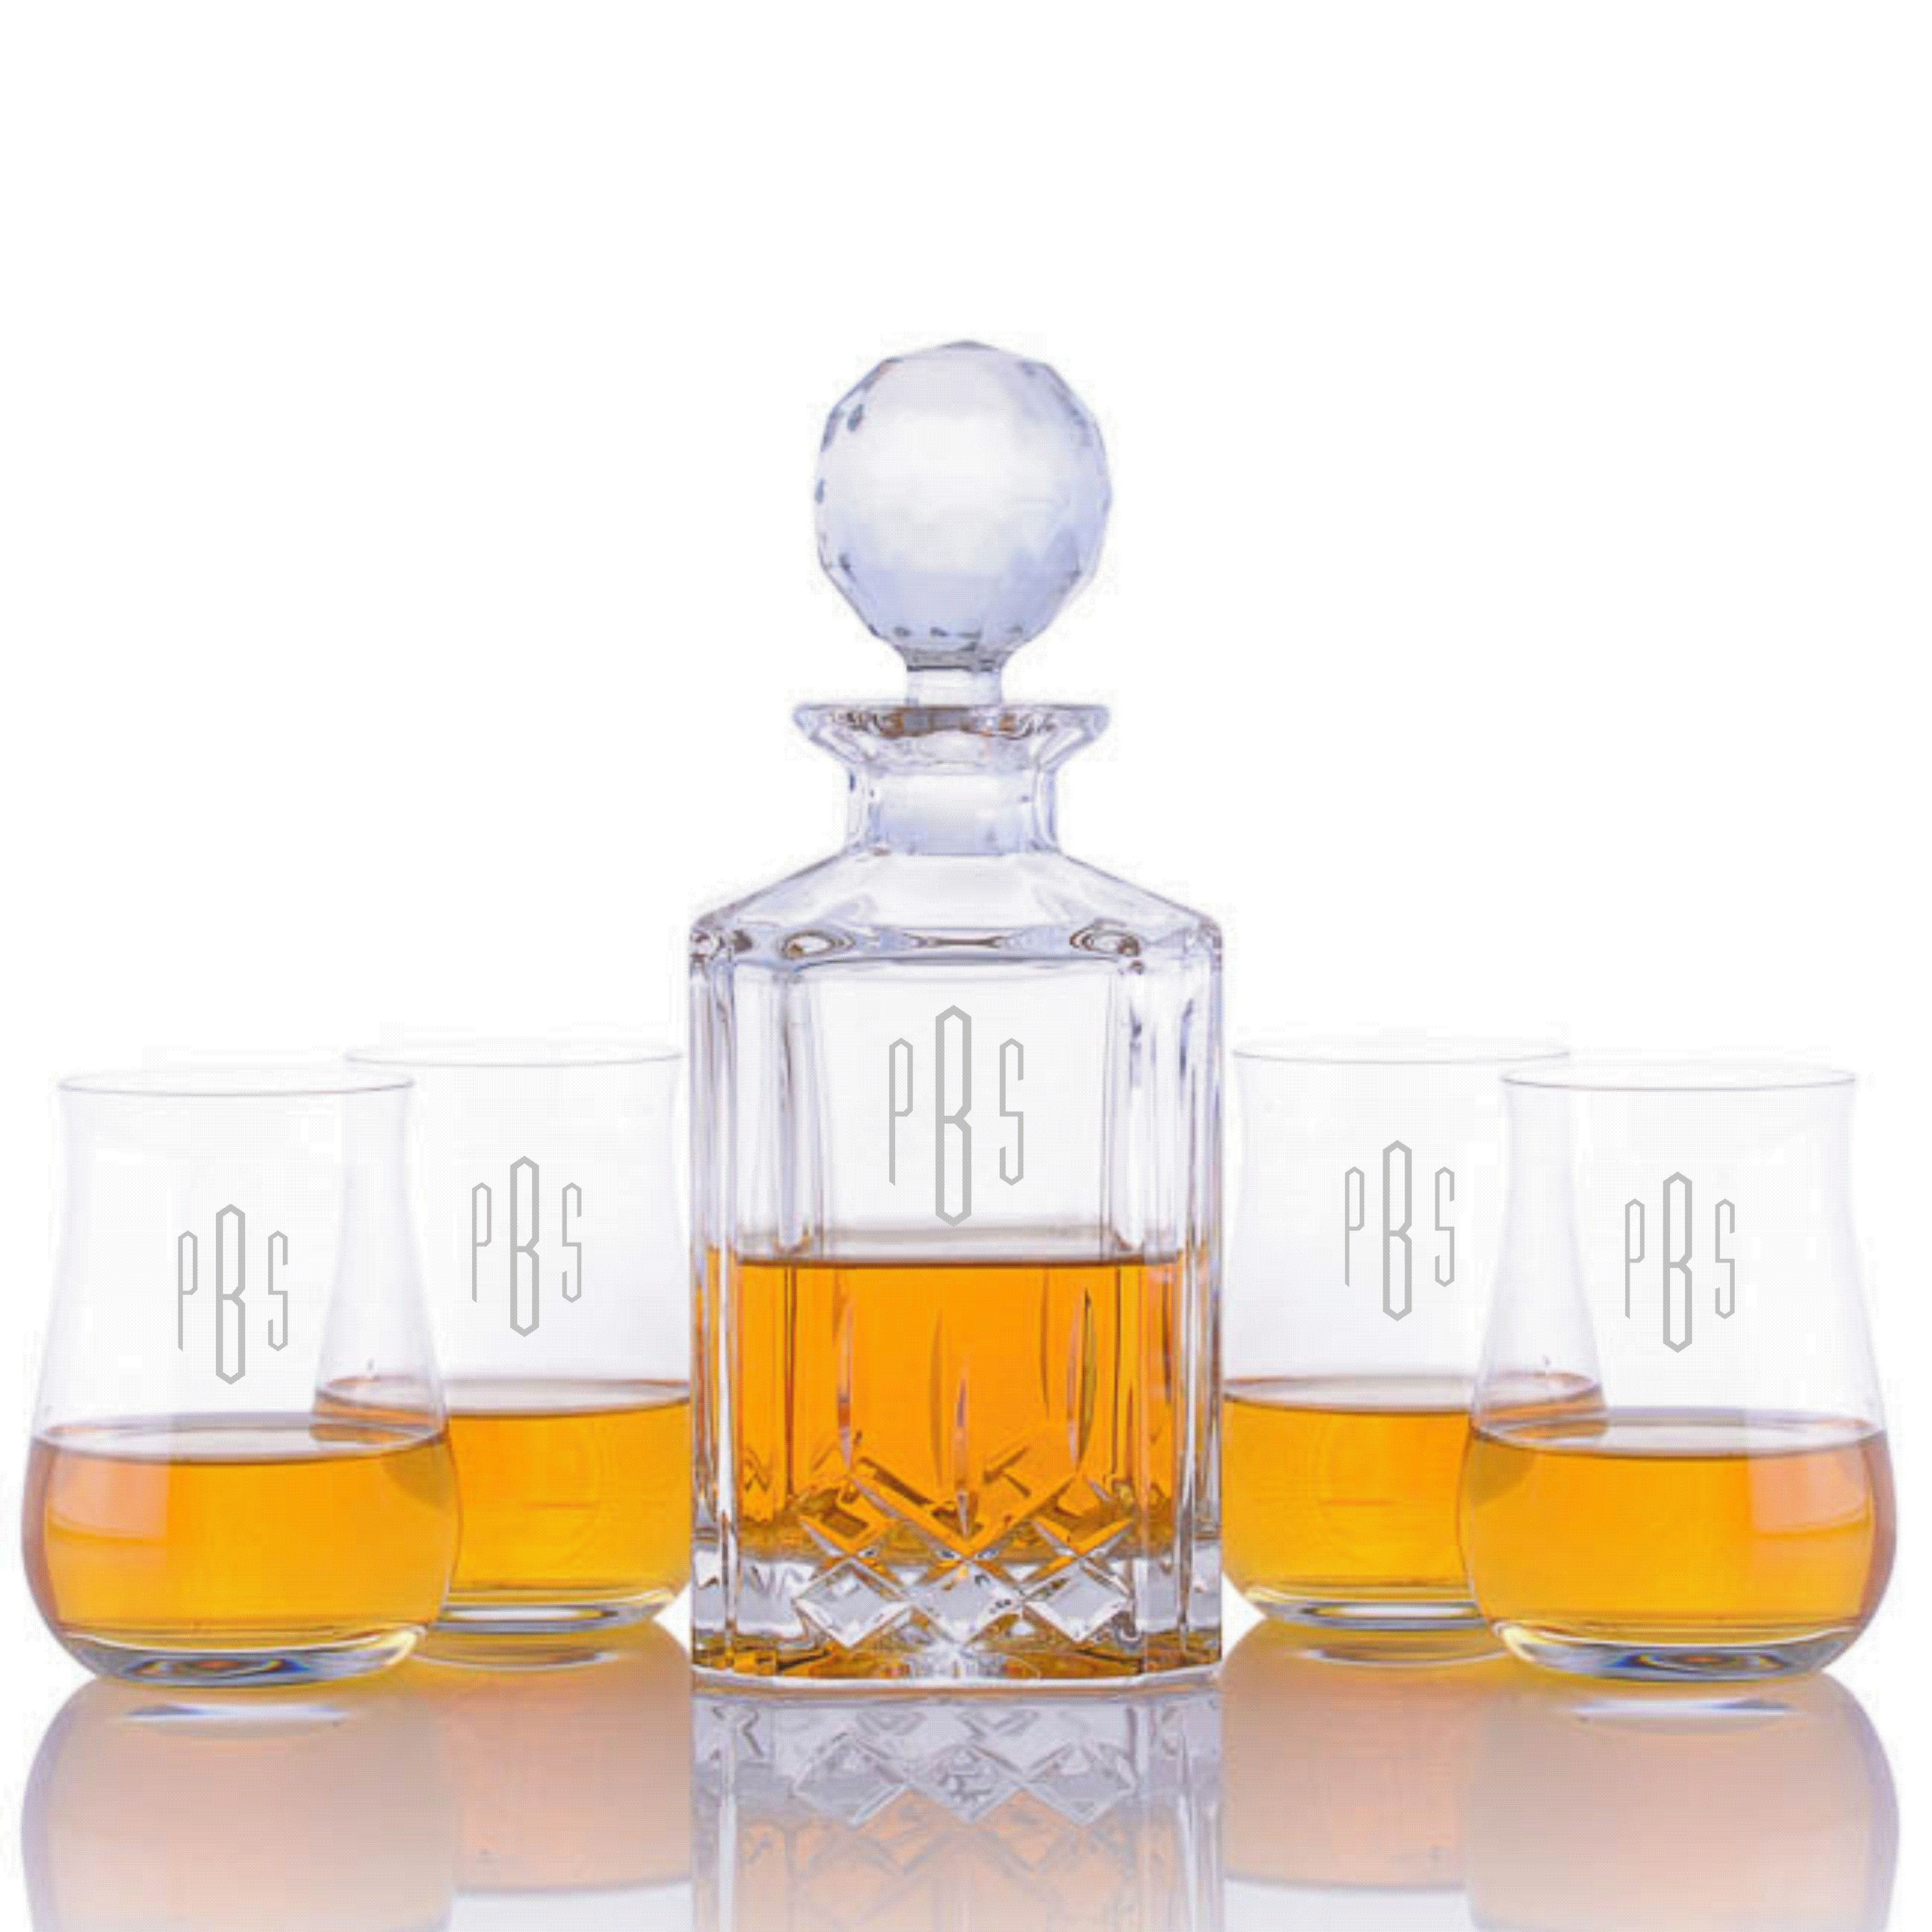 Elegant Engraved Cut Crystal Decanter U0026 Scotch Glasses Set #personalized #crystal  #gift